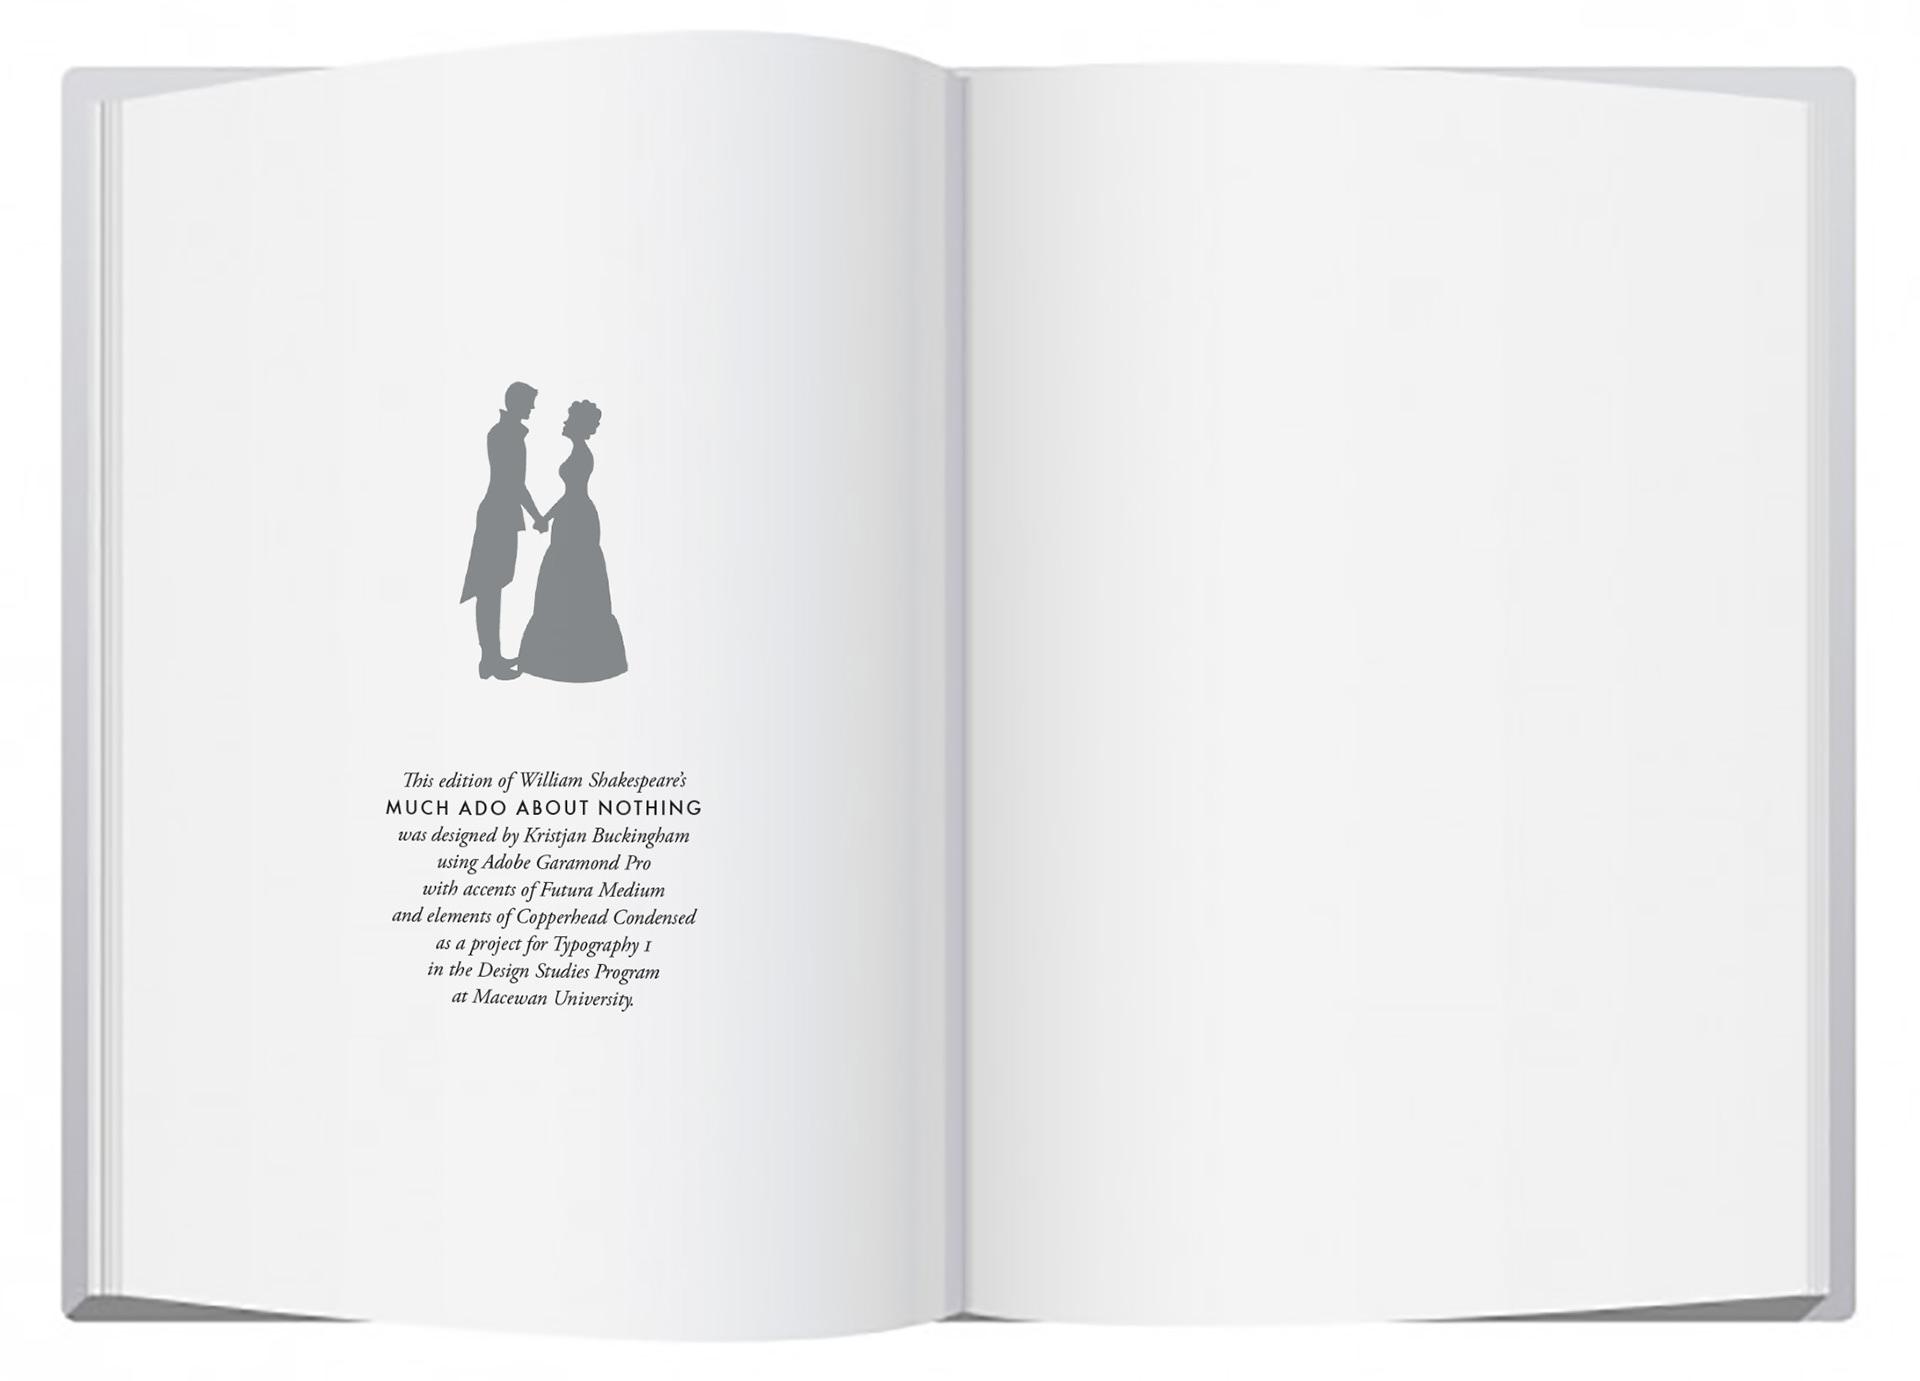 Kristjan Buckingham - Book Layout